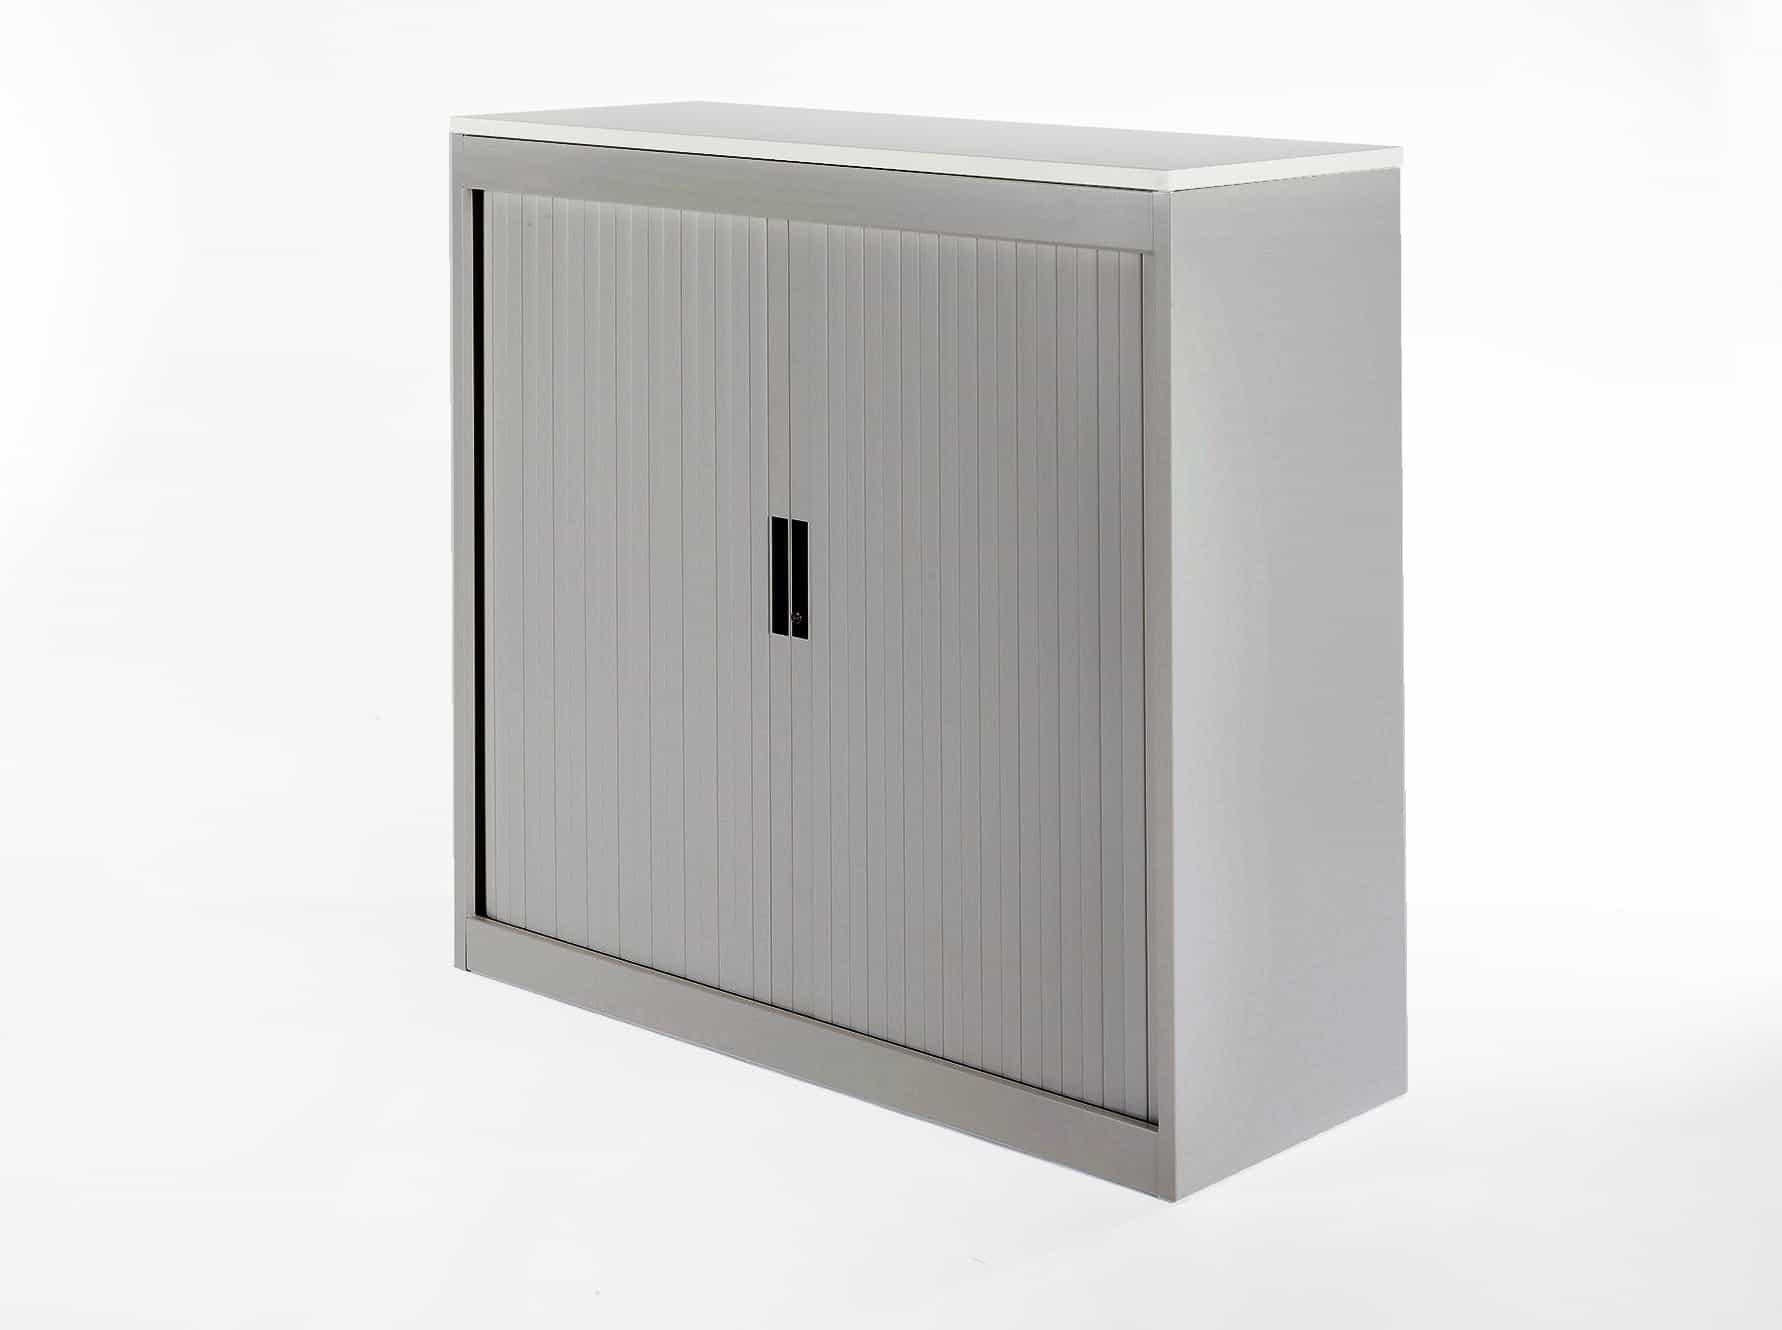 Roldeur Voor Kast : Roldeur kast roldeurkast inofel 105 x 120 x 45 cm zwart eiken top